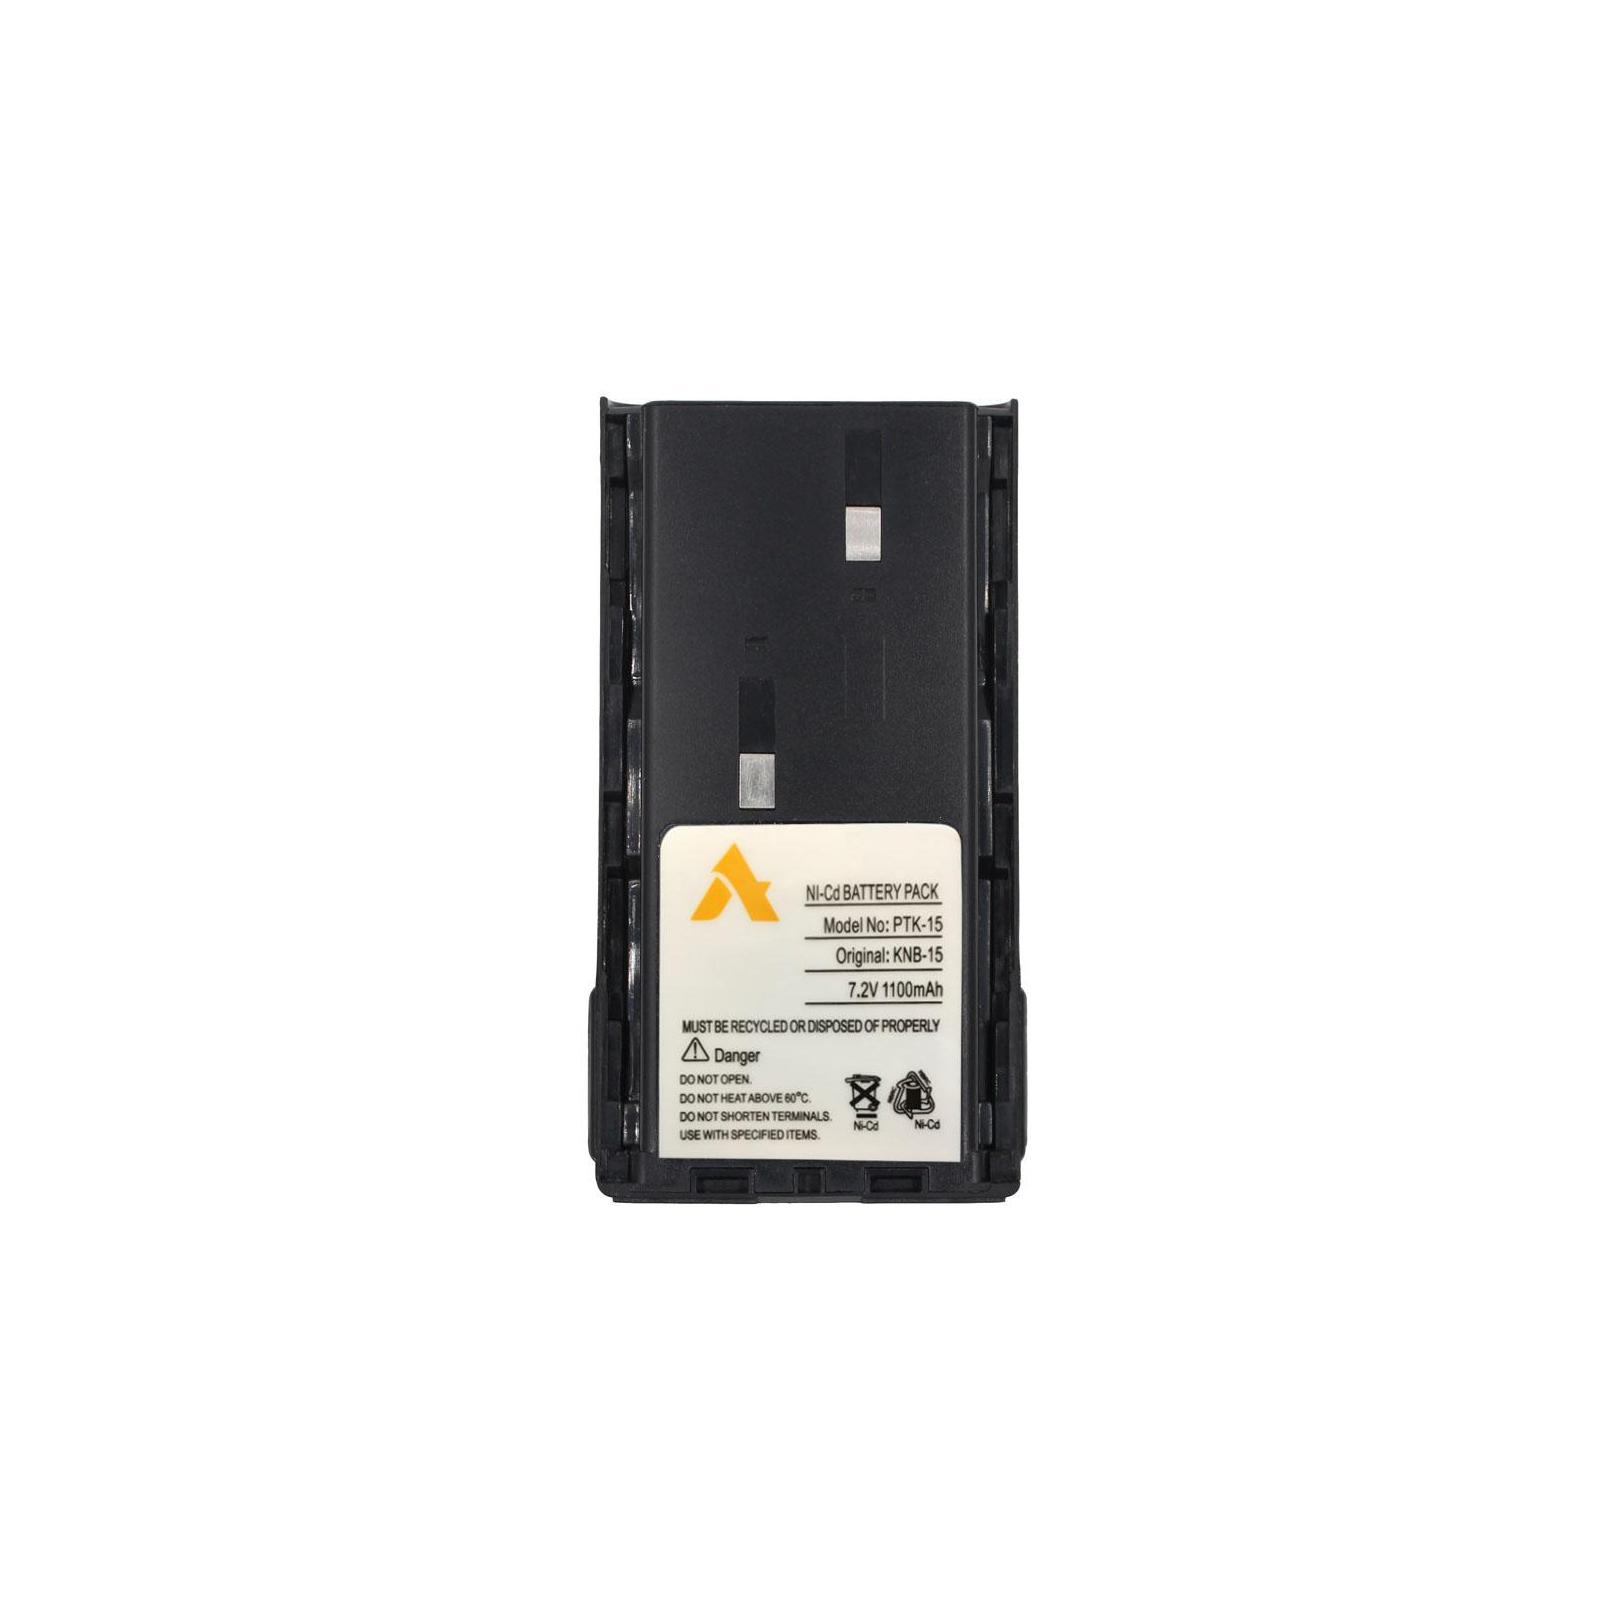 Аккумуляторная батарея для телефона Agent эквивалент акумулятора KNB-15 для Kenwood 1100mAh NiCd (PTK-15)